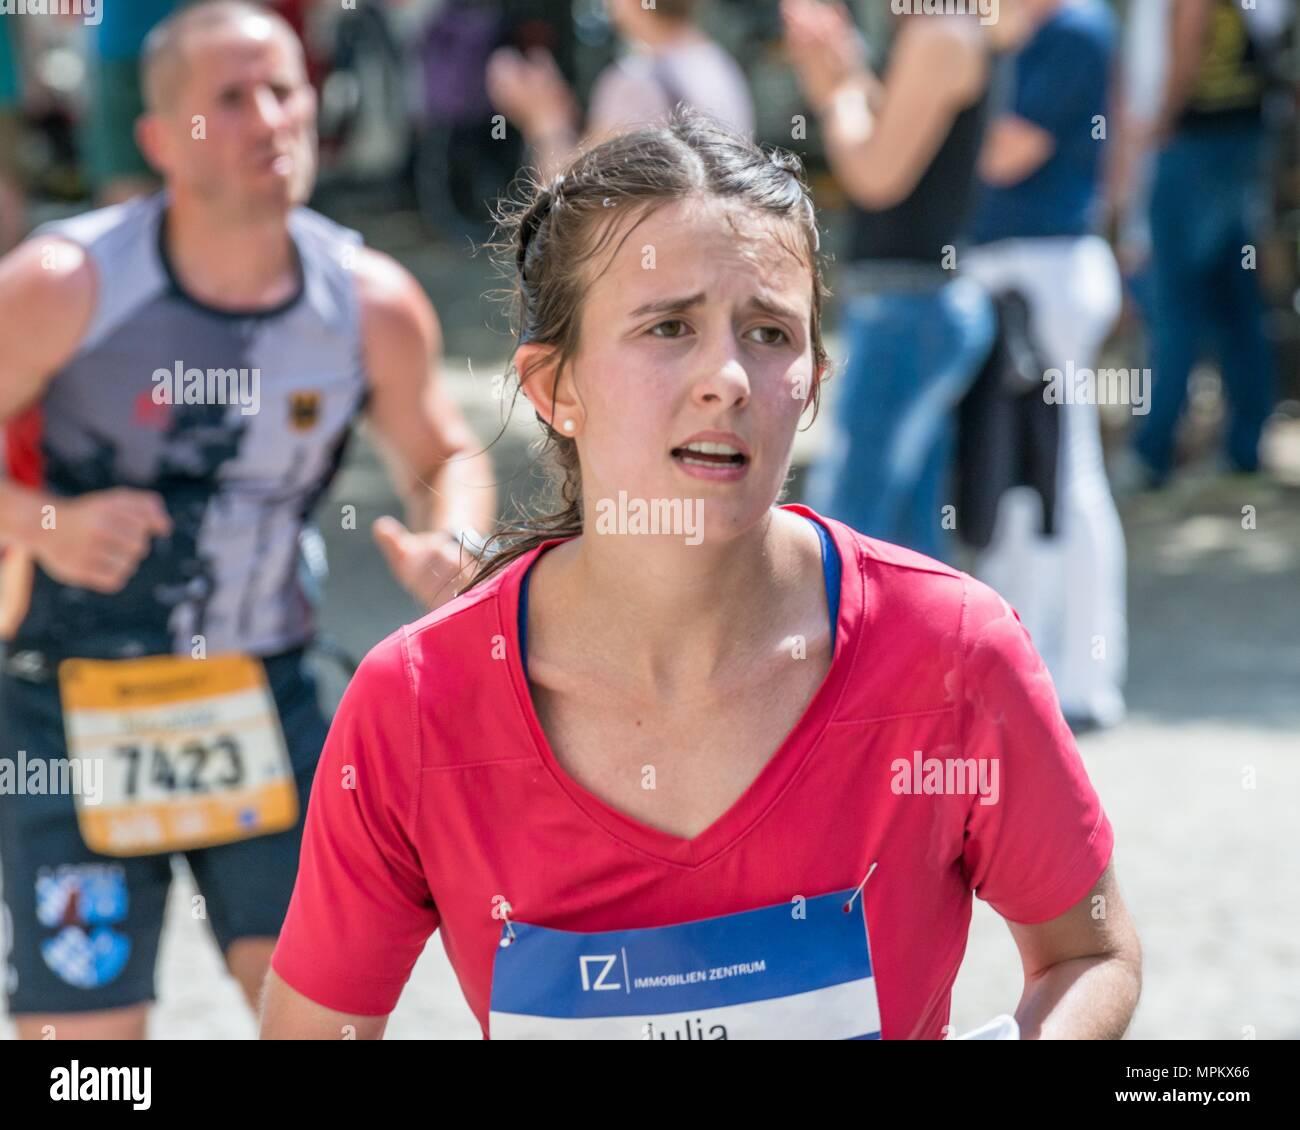 Regensburg, Bavaria, Germany, May 13, 2018: Participant of the Regensburg Marathon 2018 at the old city hall - Stock Image